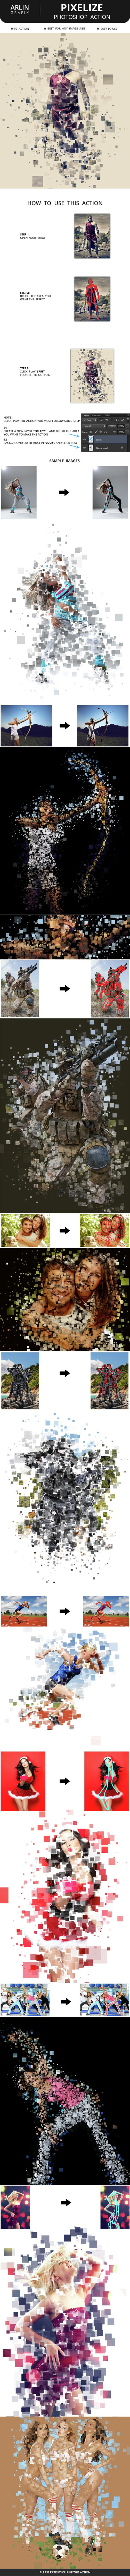 Pixelize Photoshop Action - Photo Effects Actions